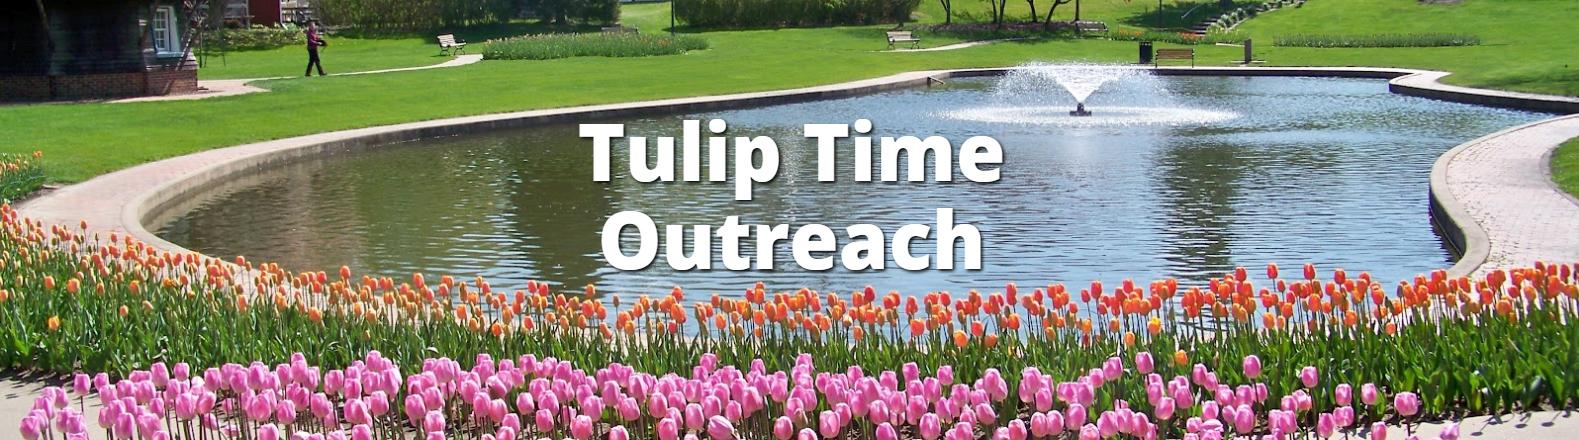 tulip time outreach